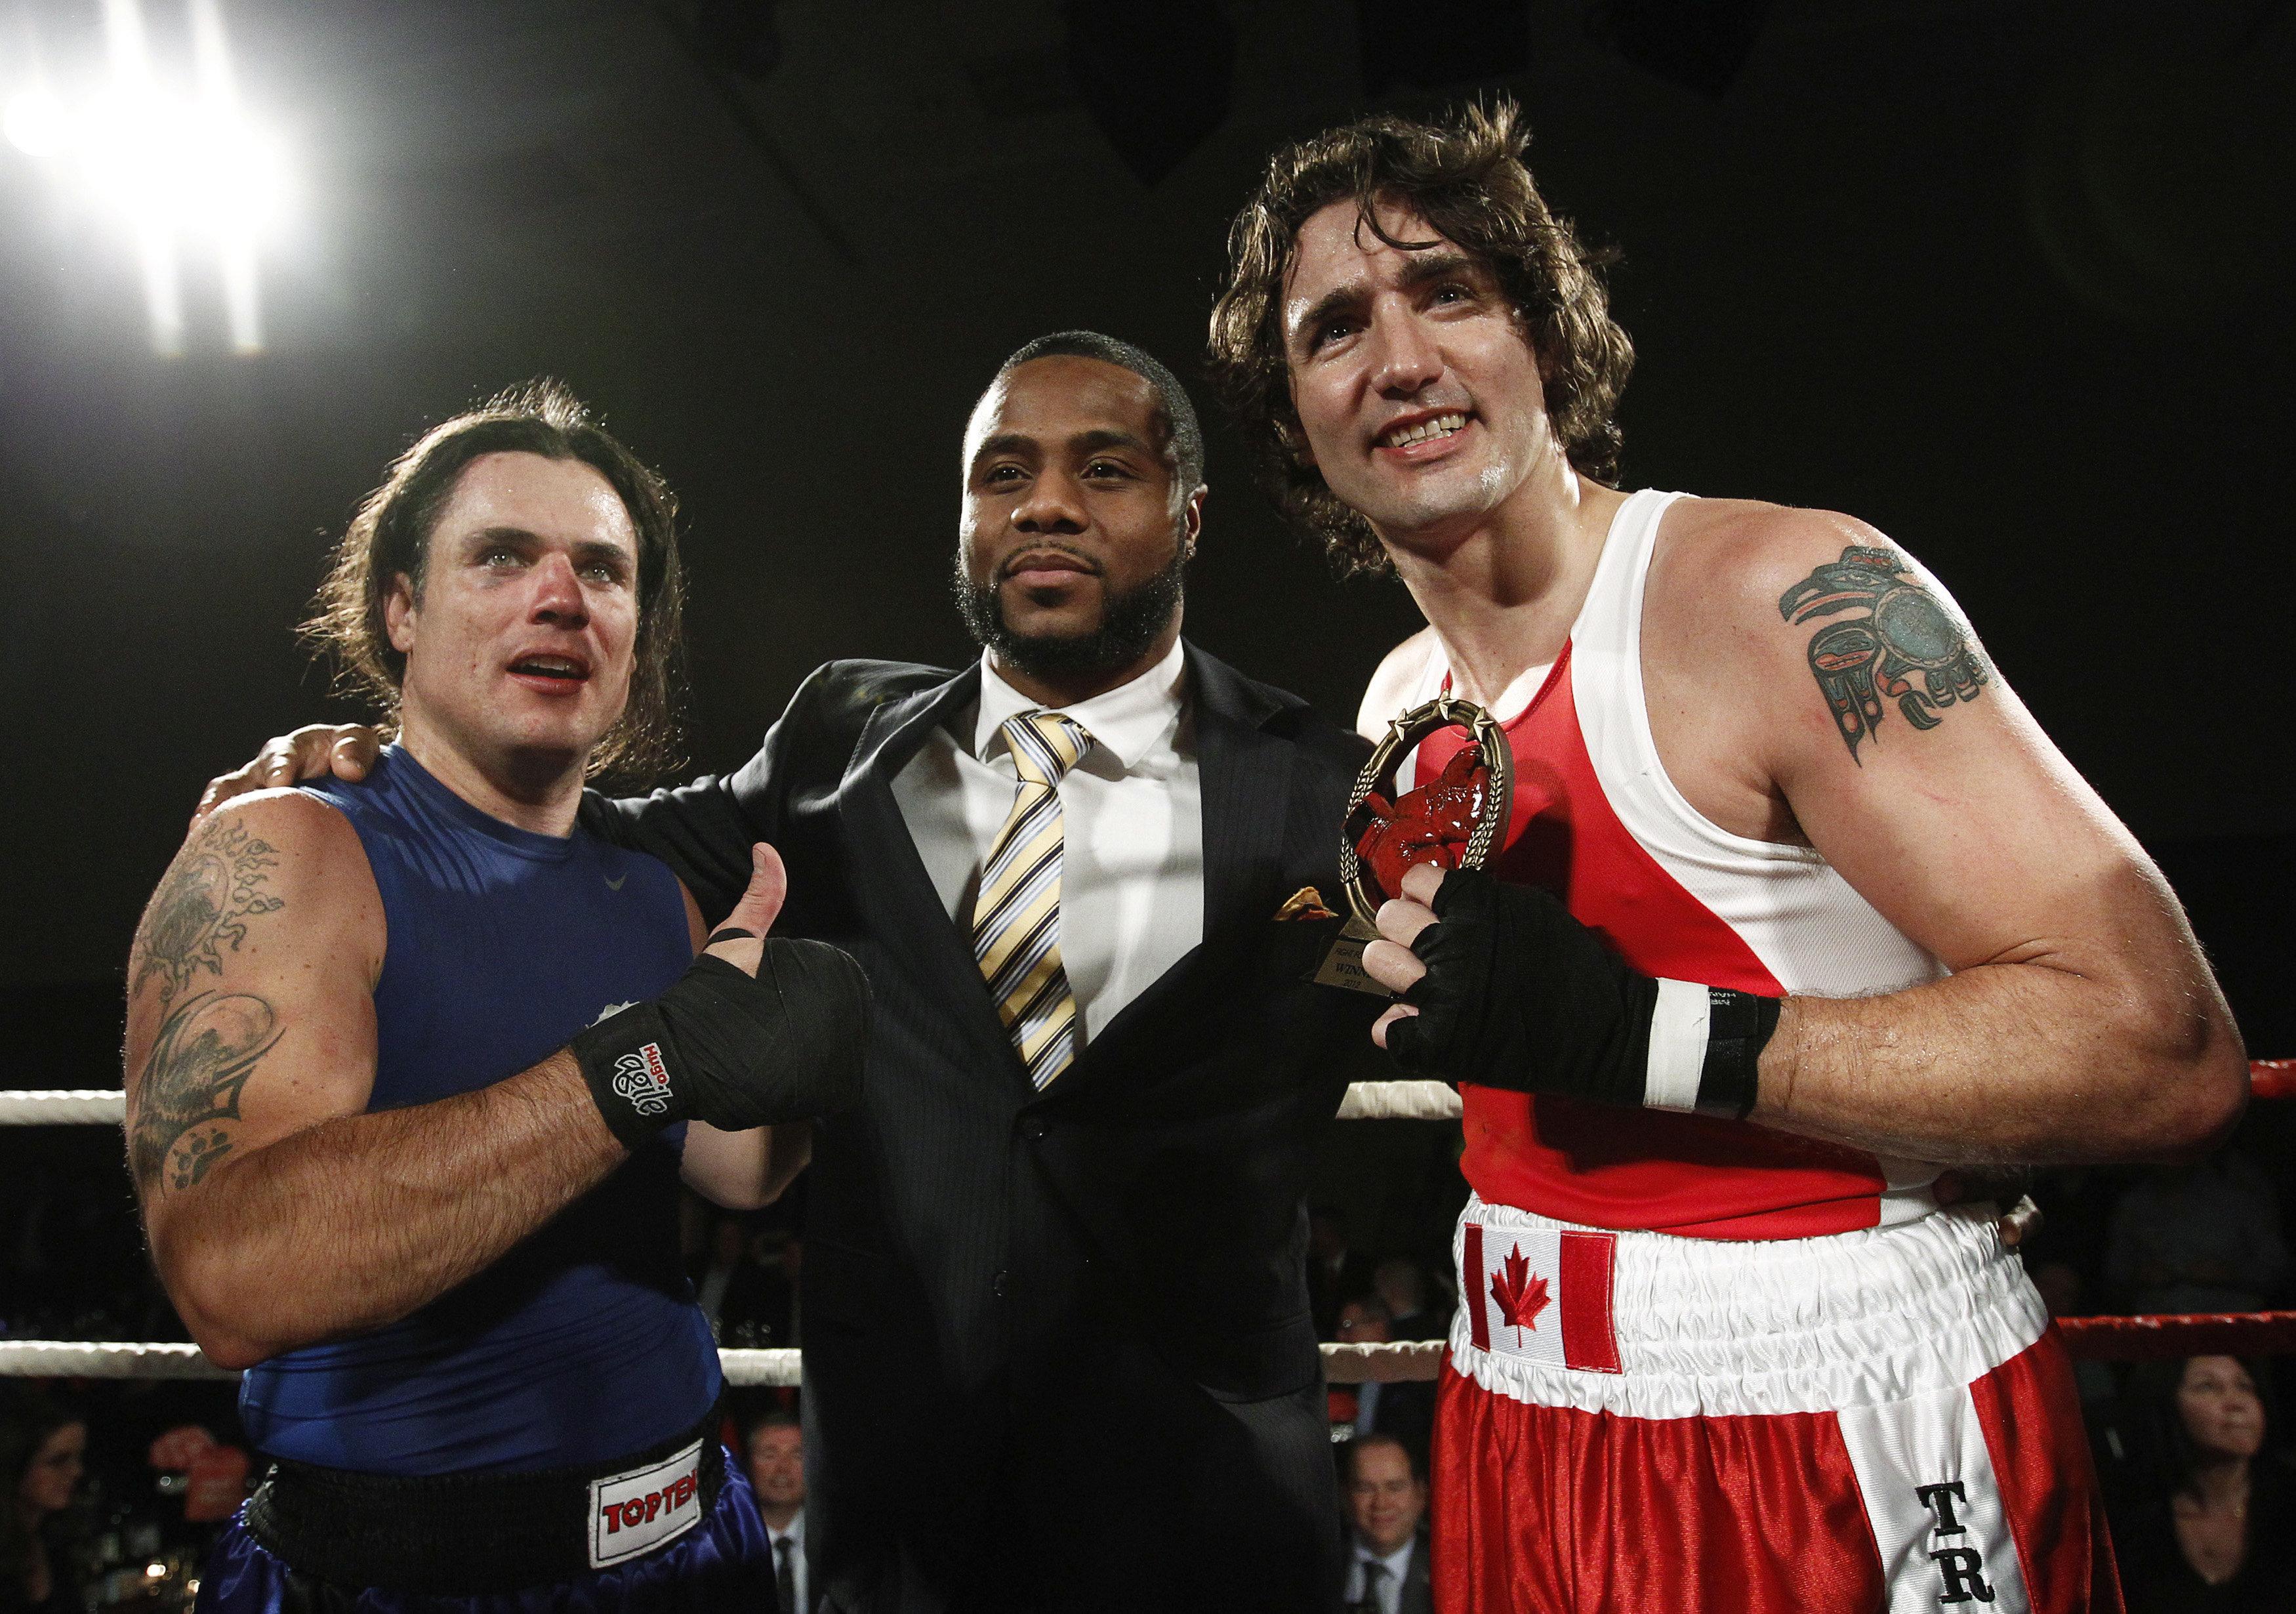 Trudeau (R) and conservative Senator Patrick Brazeau (L) pose after Trudeau defeated Brazeau during their...